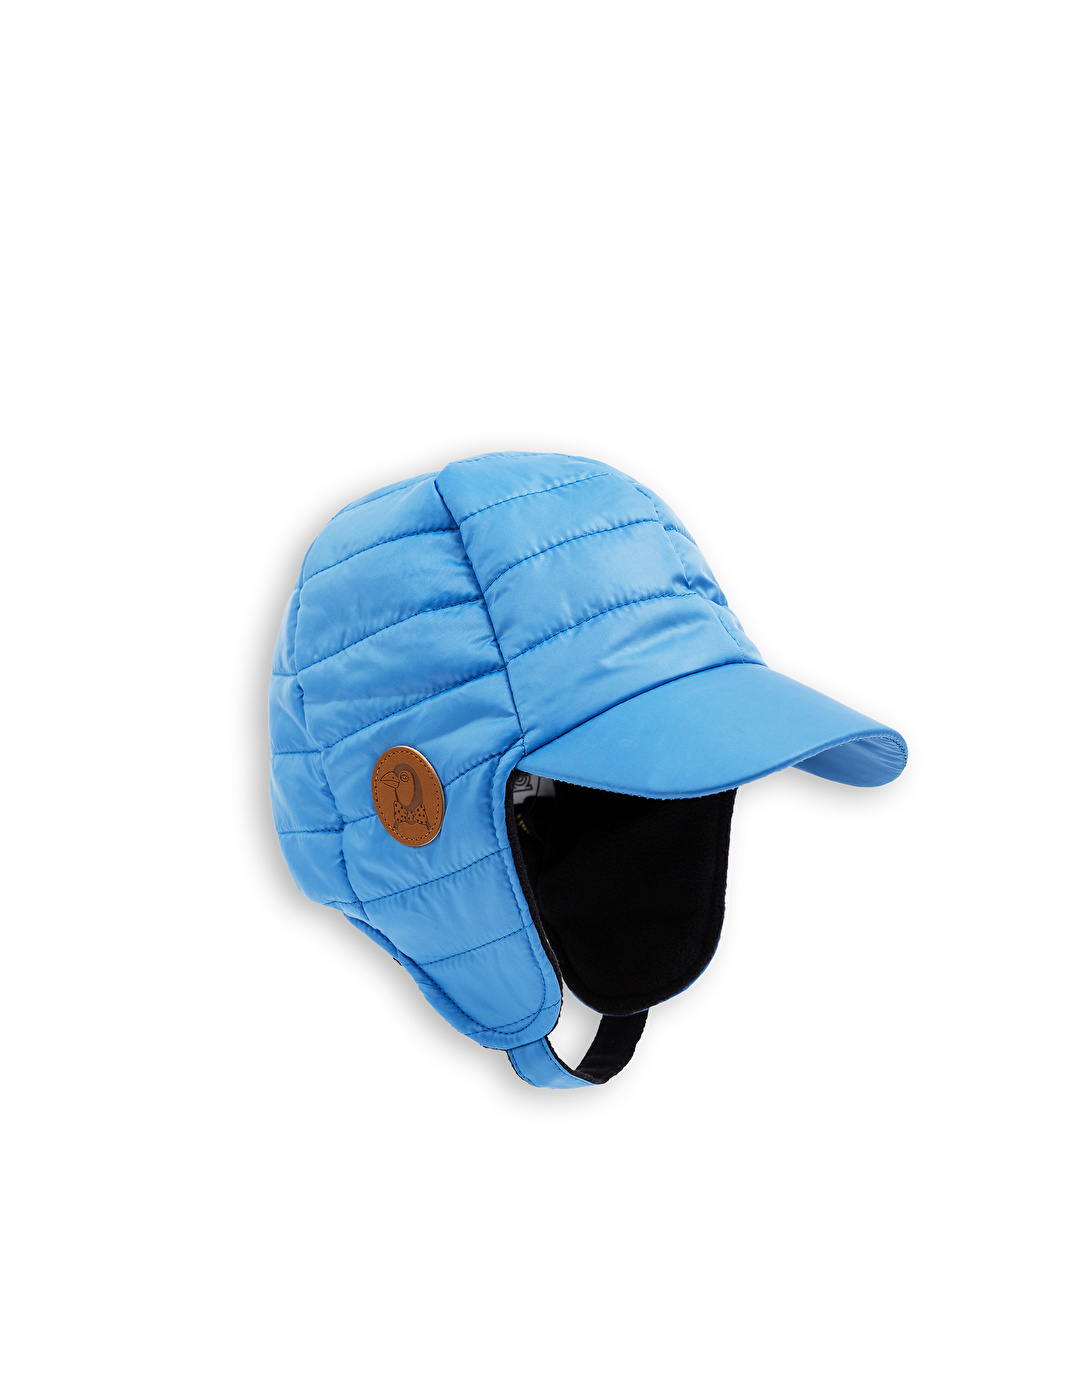 1776512050-1-mini-rodini-insulator-cap-light-blue